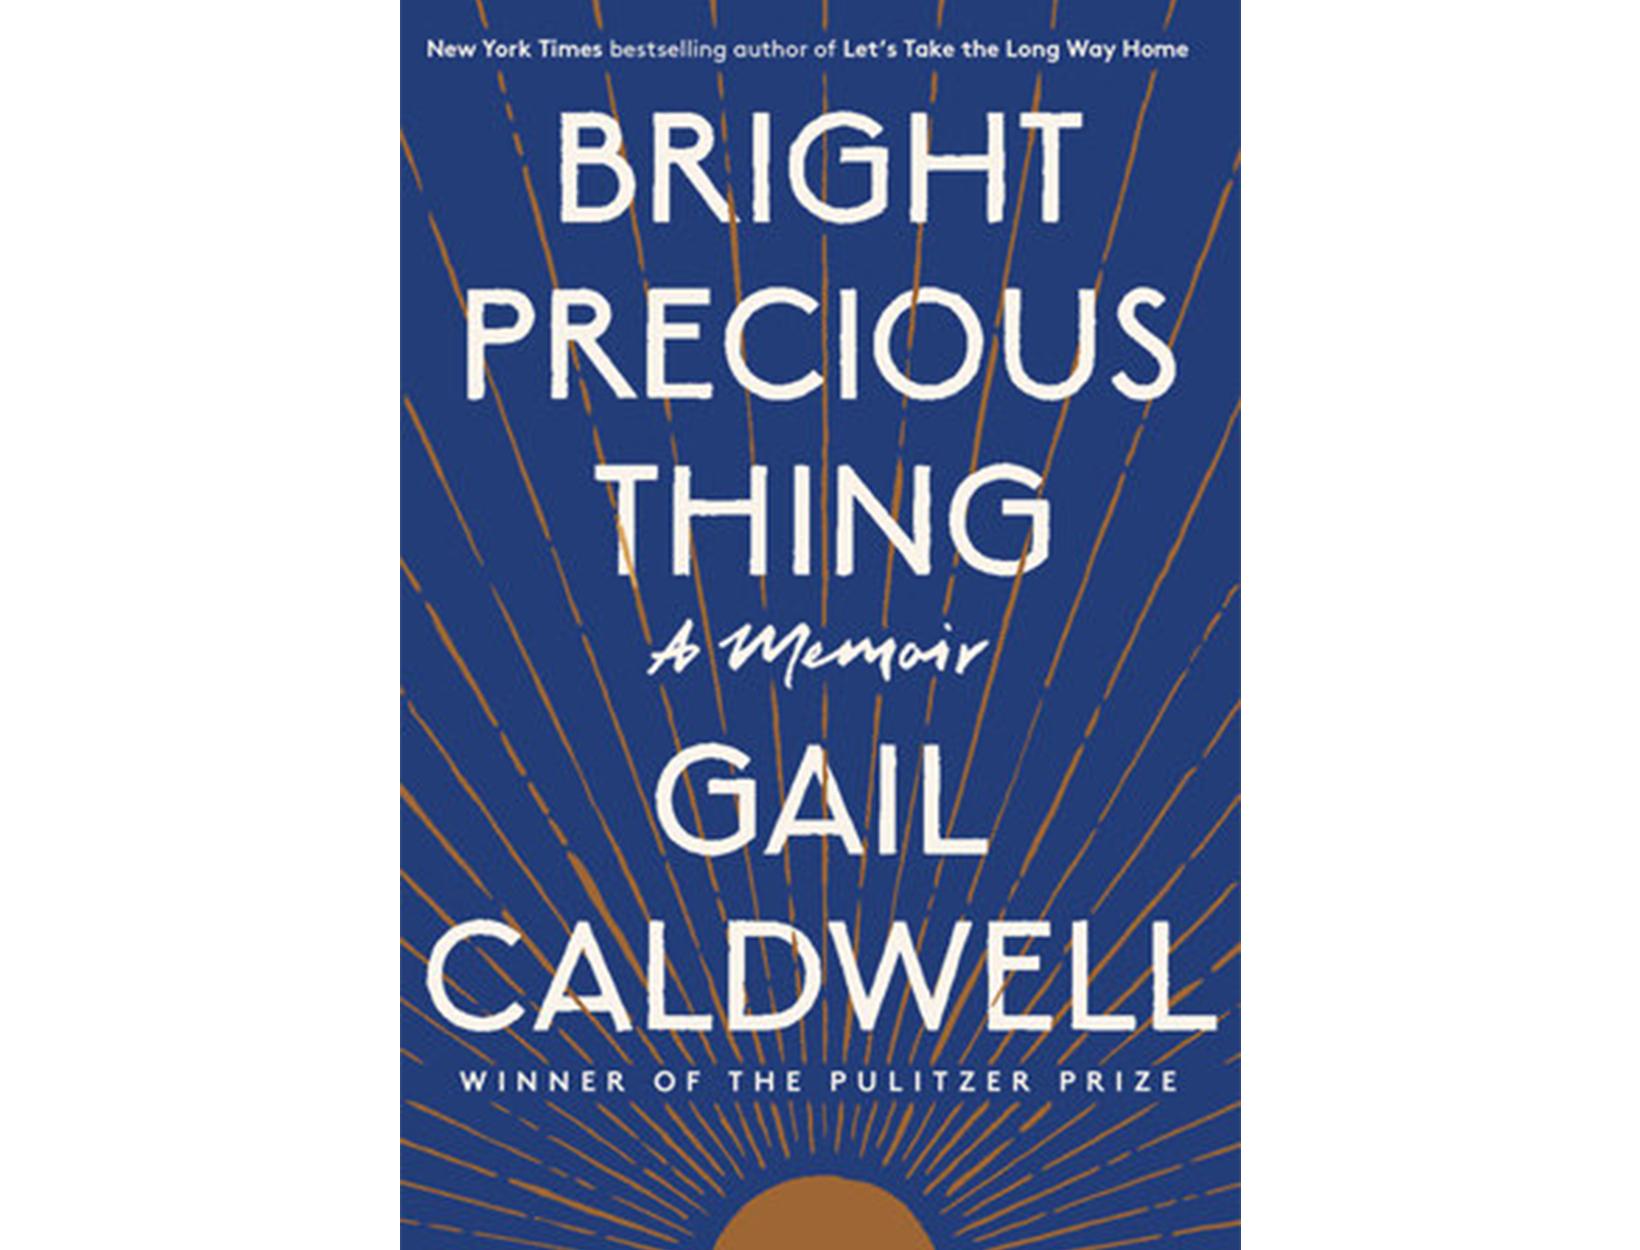 <em>Bright Precious Thing</em> by Gail Caldwell